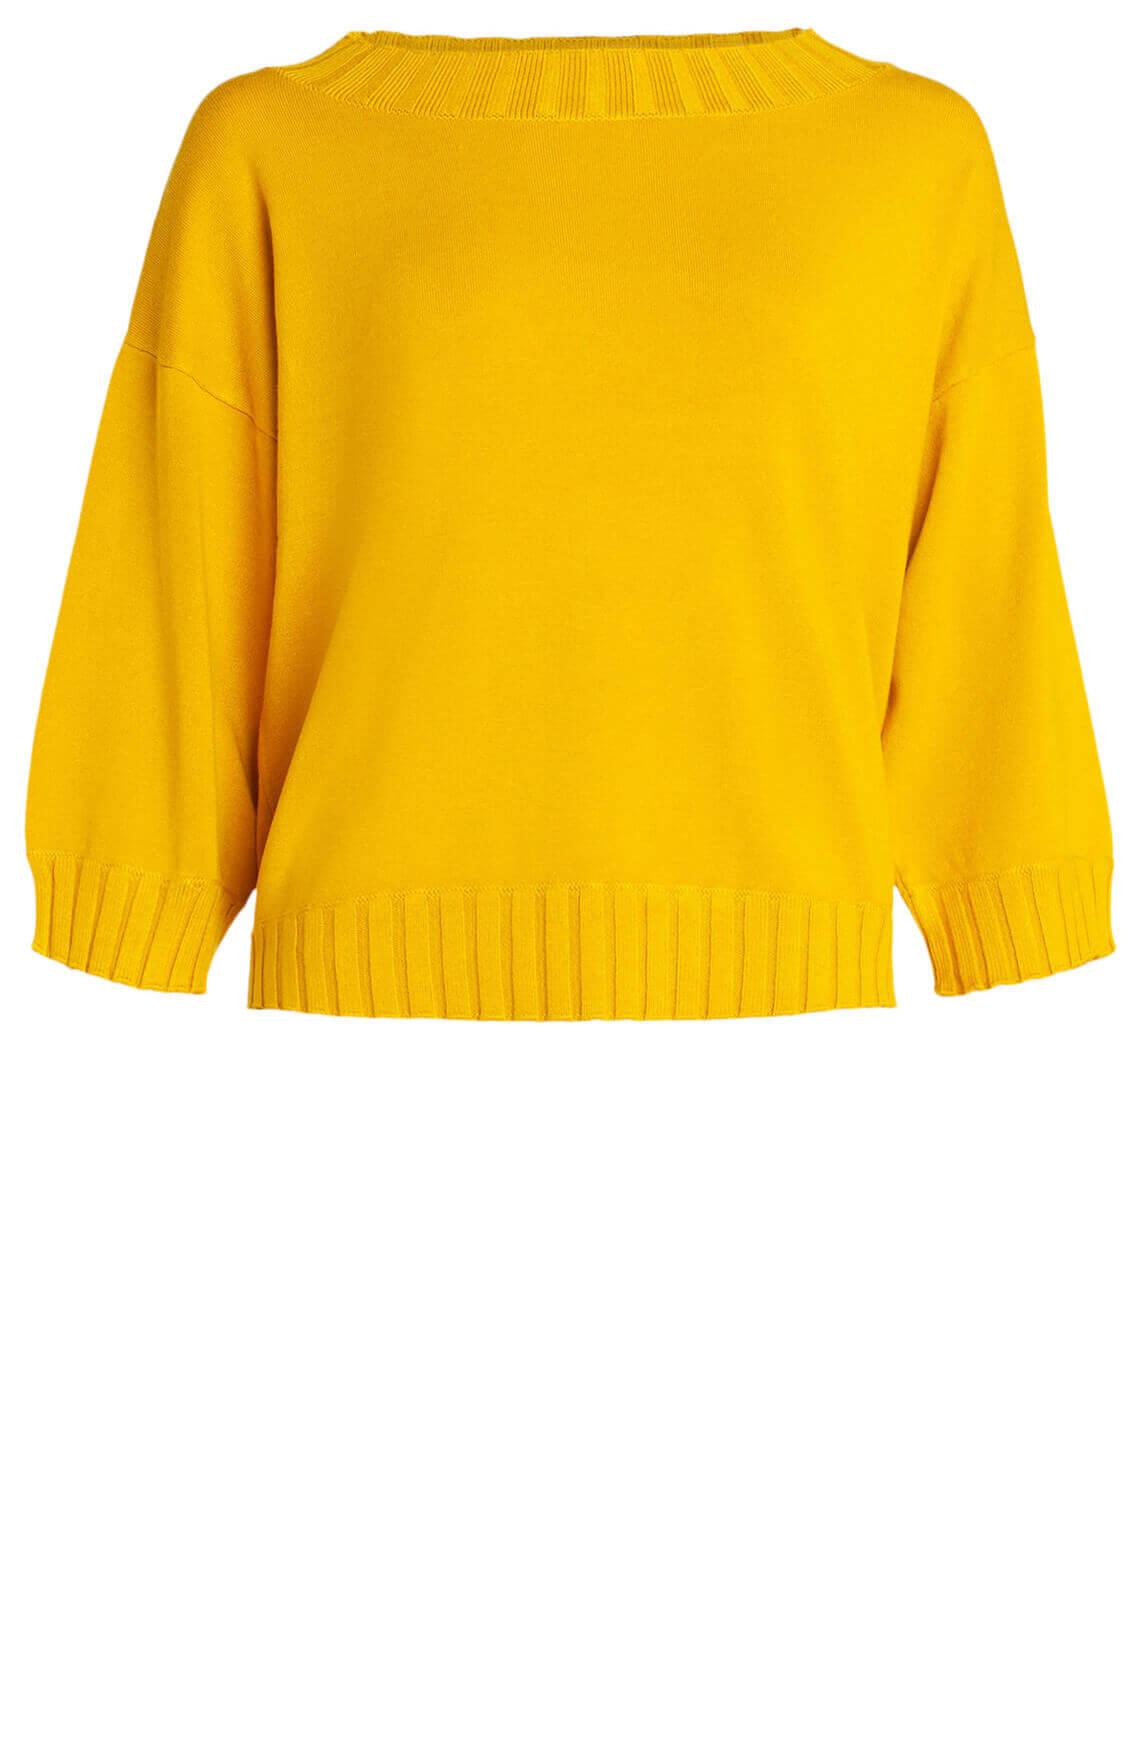 Anna Dames Wijde pullover geel